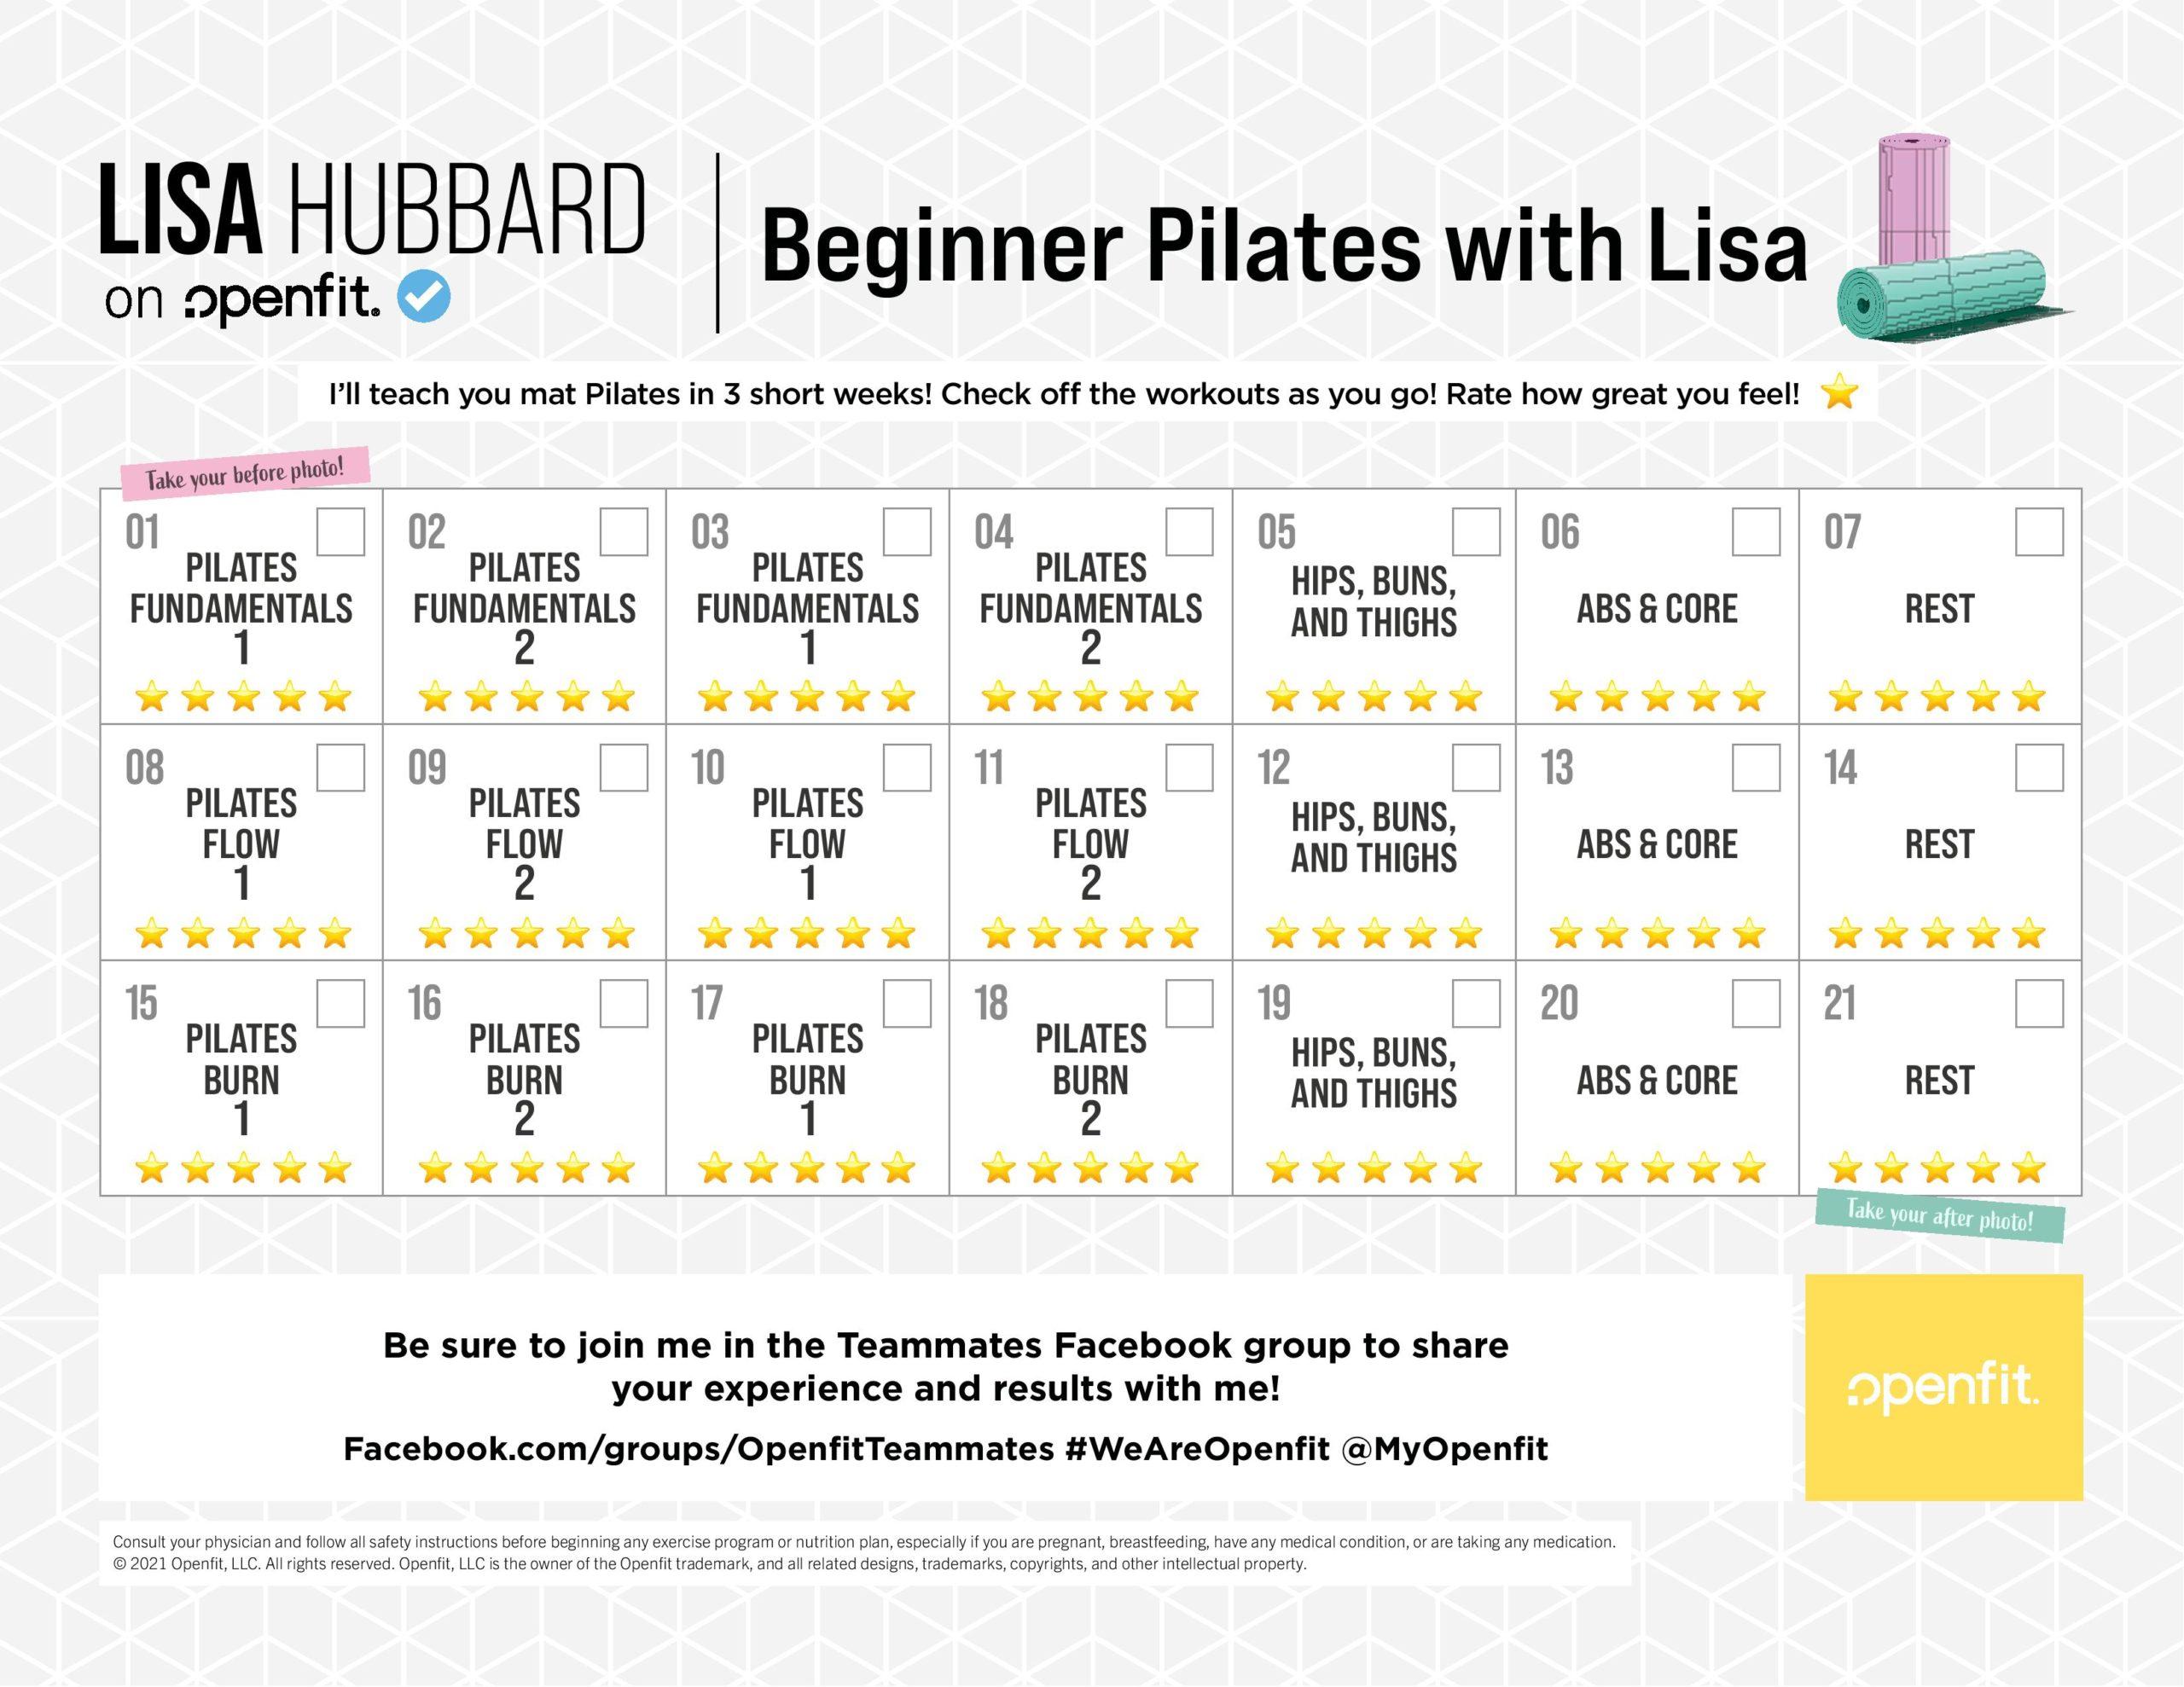 lisa hubbard program calendar